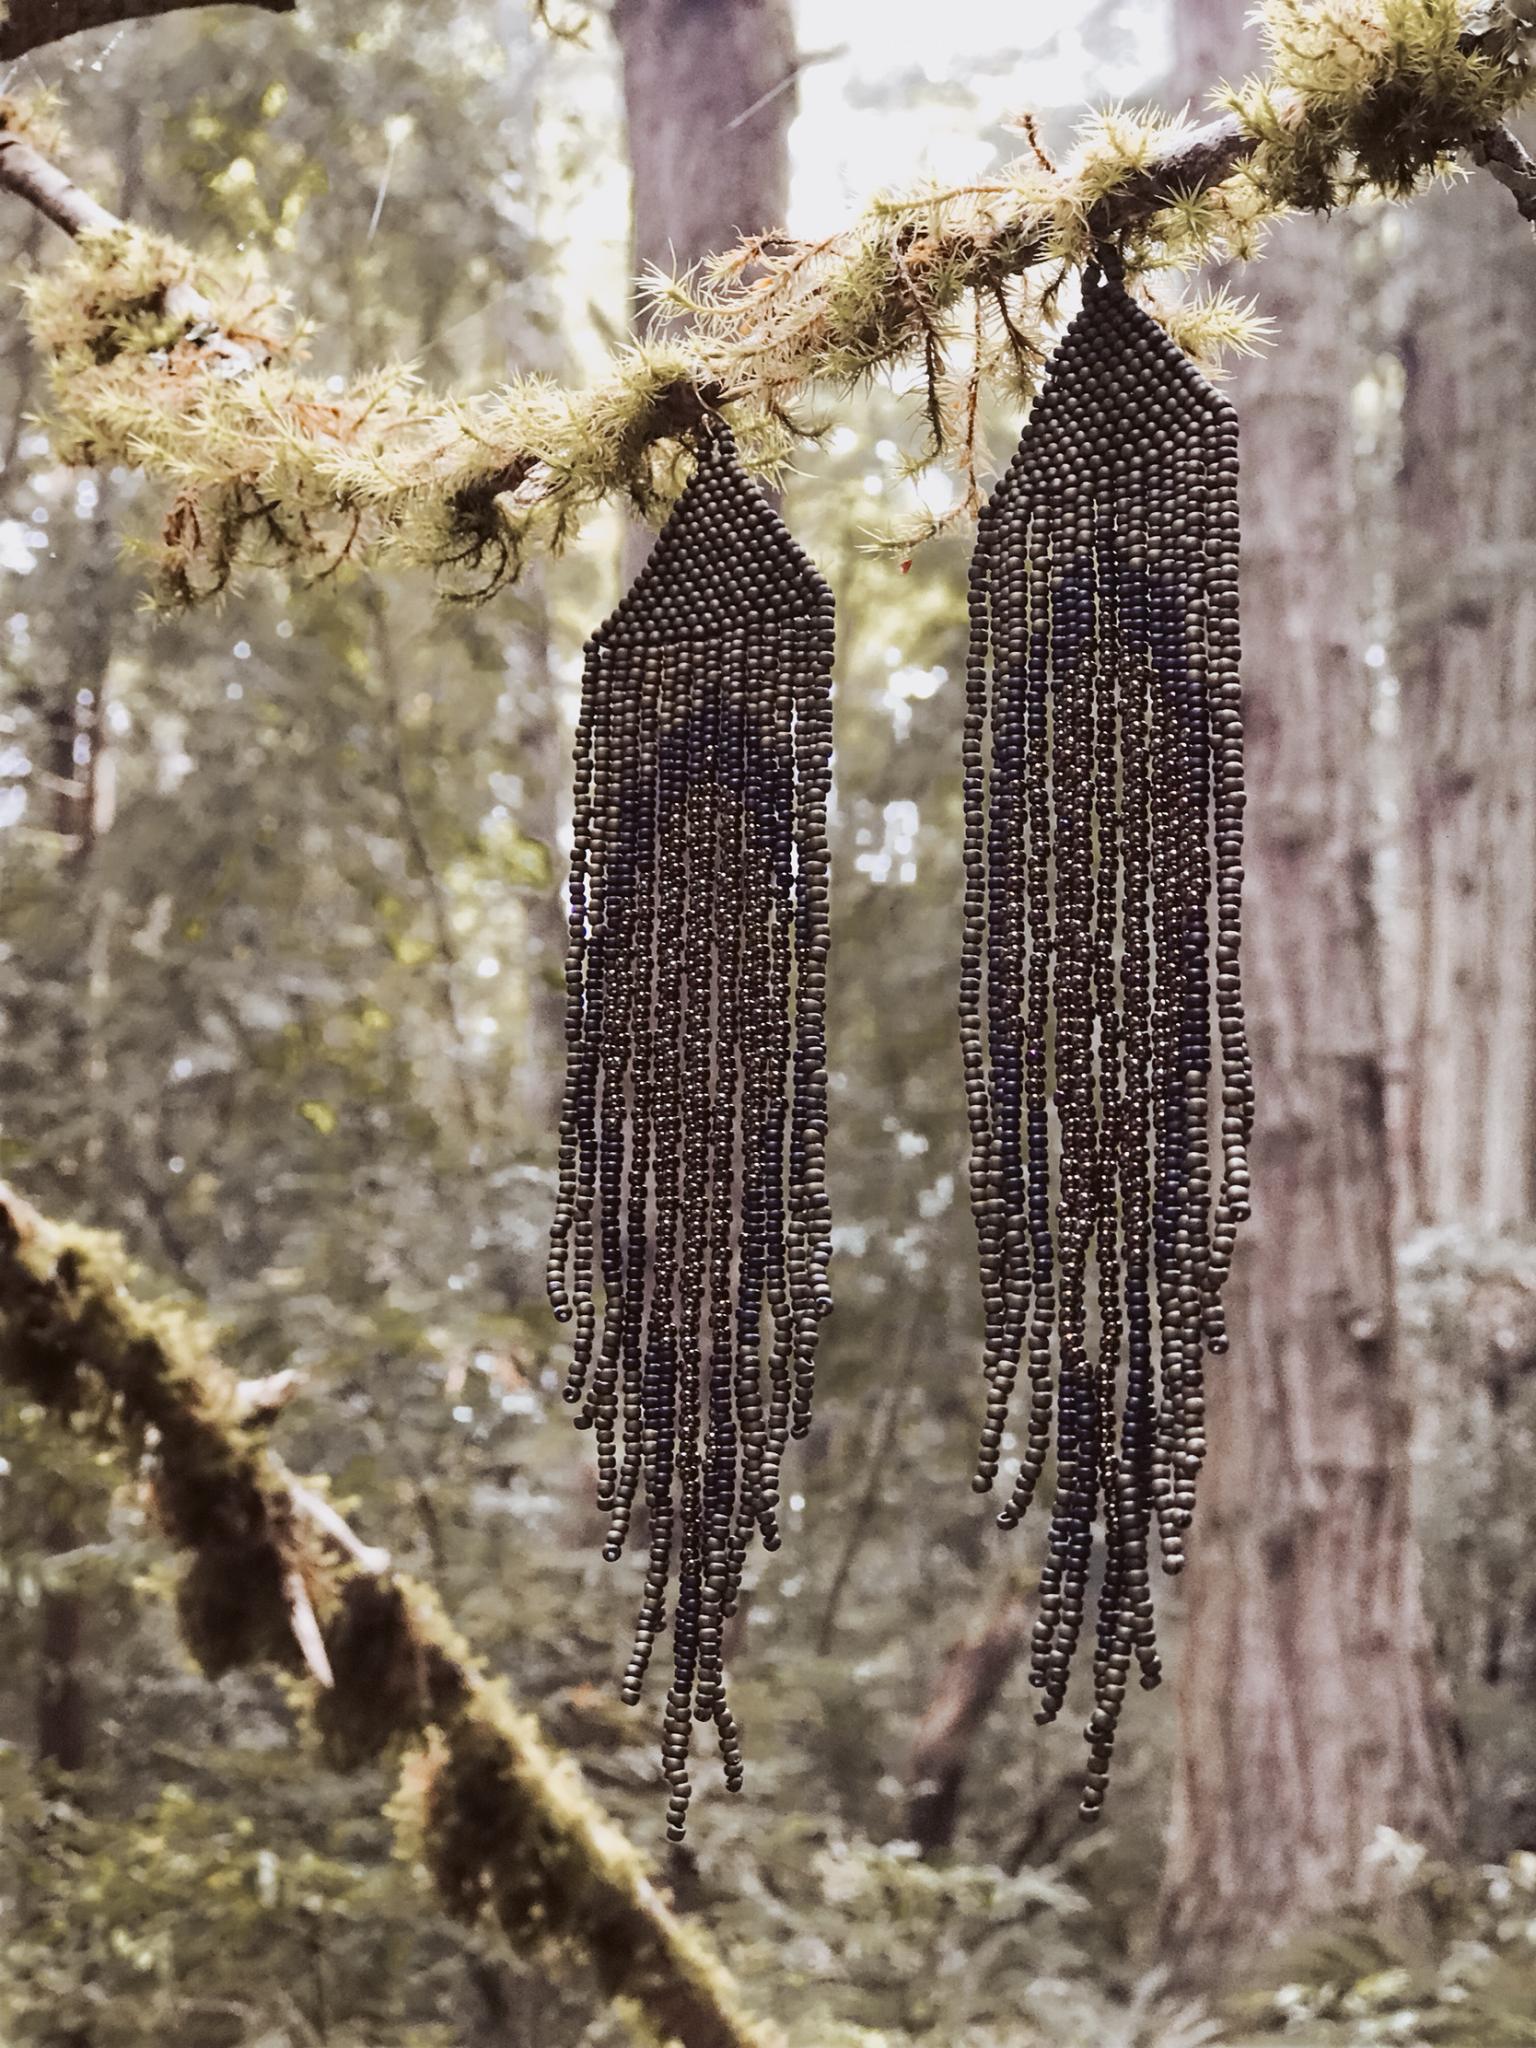 geode shoulder dusters in forest A0BW6STDVEHGP